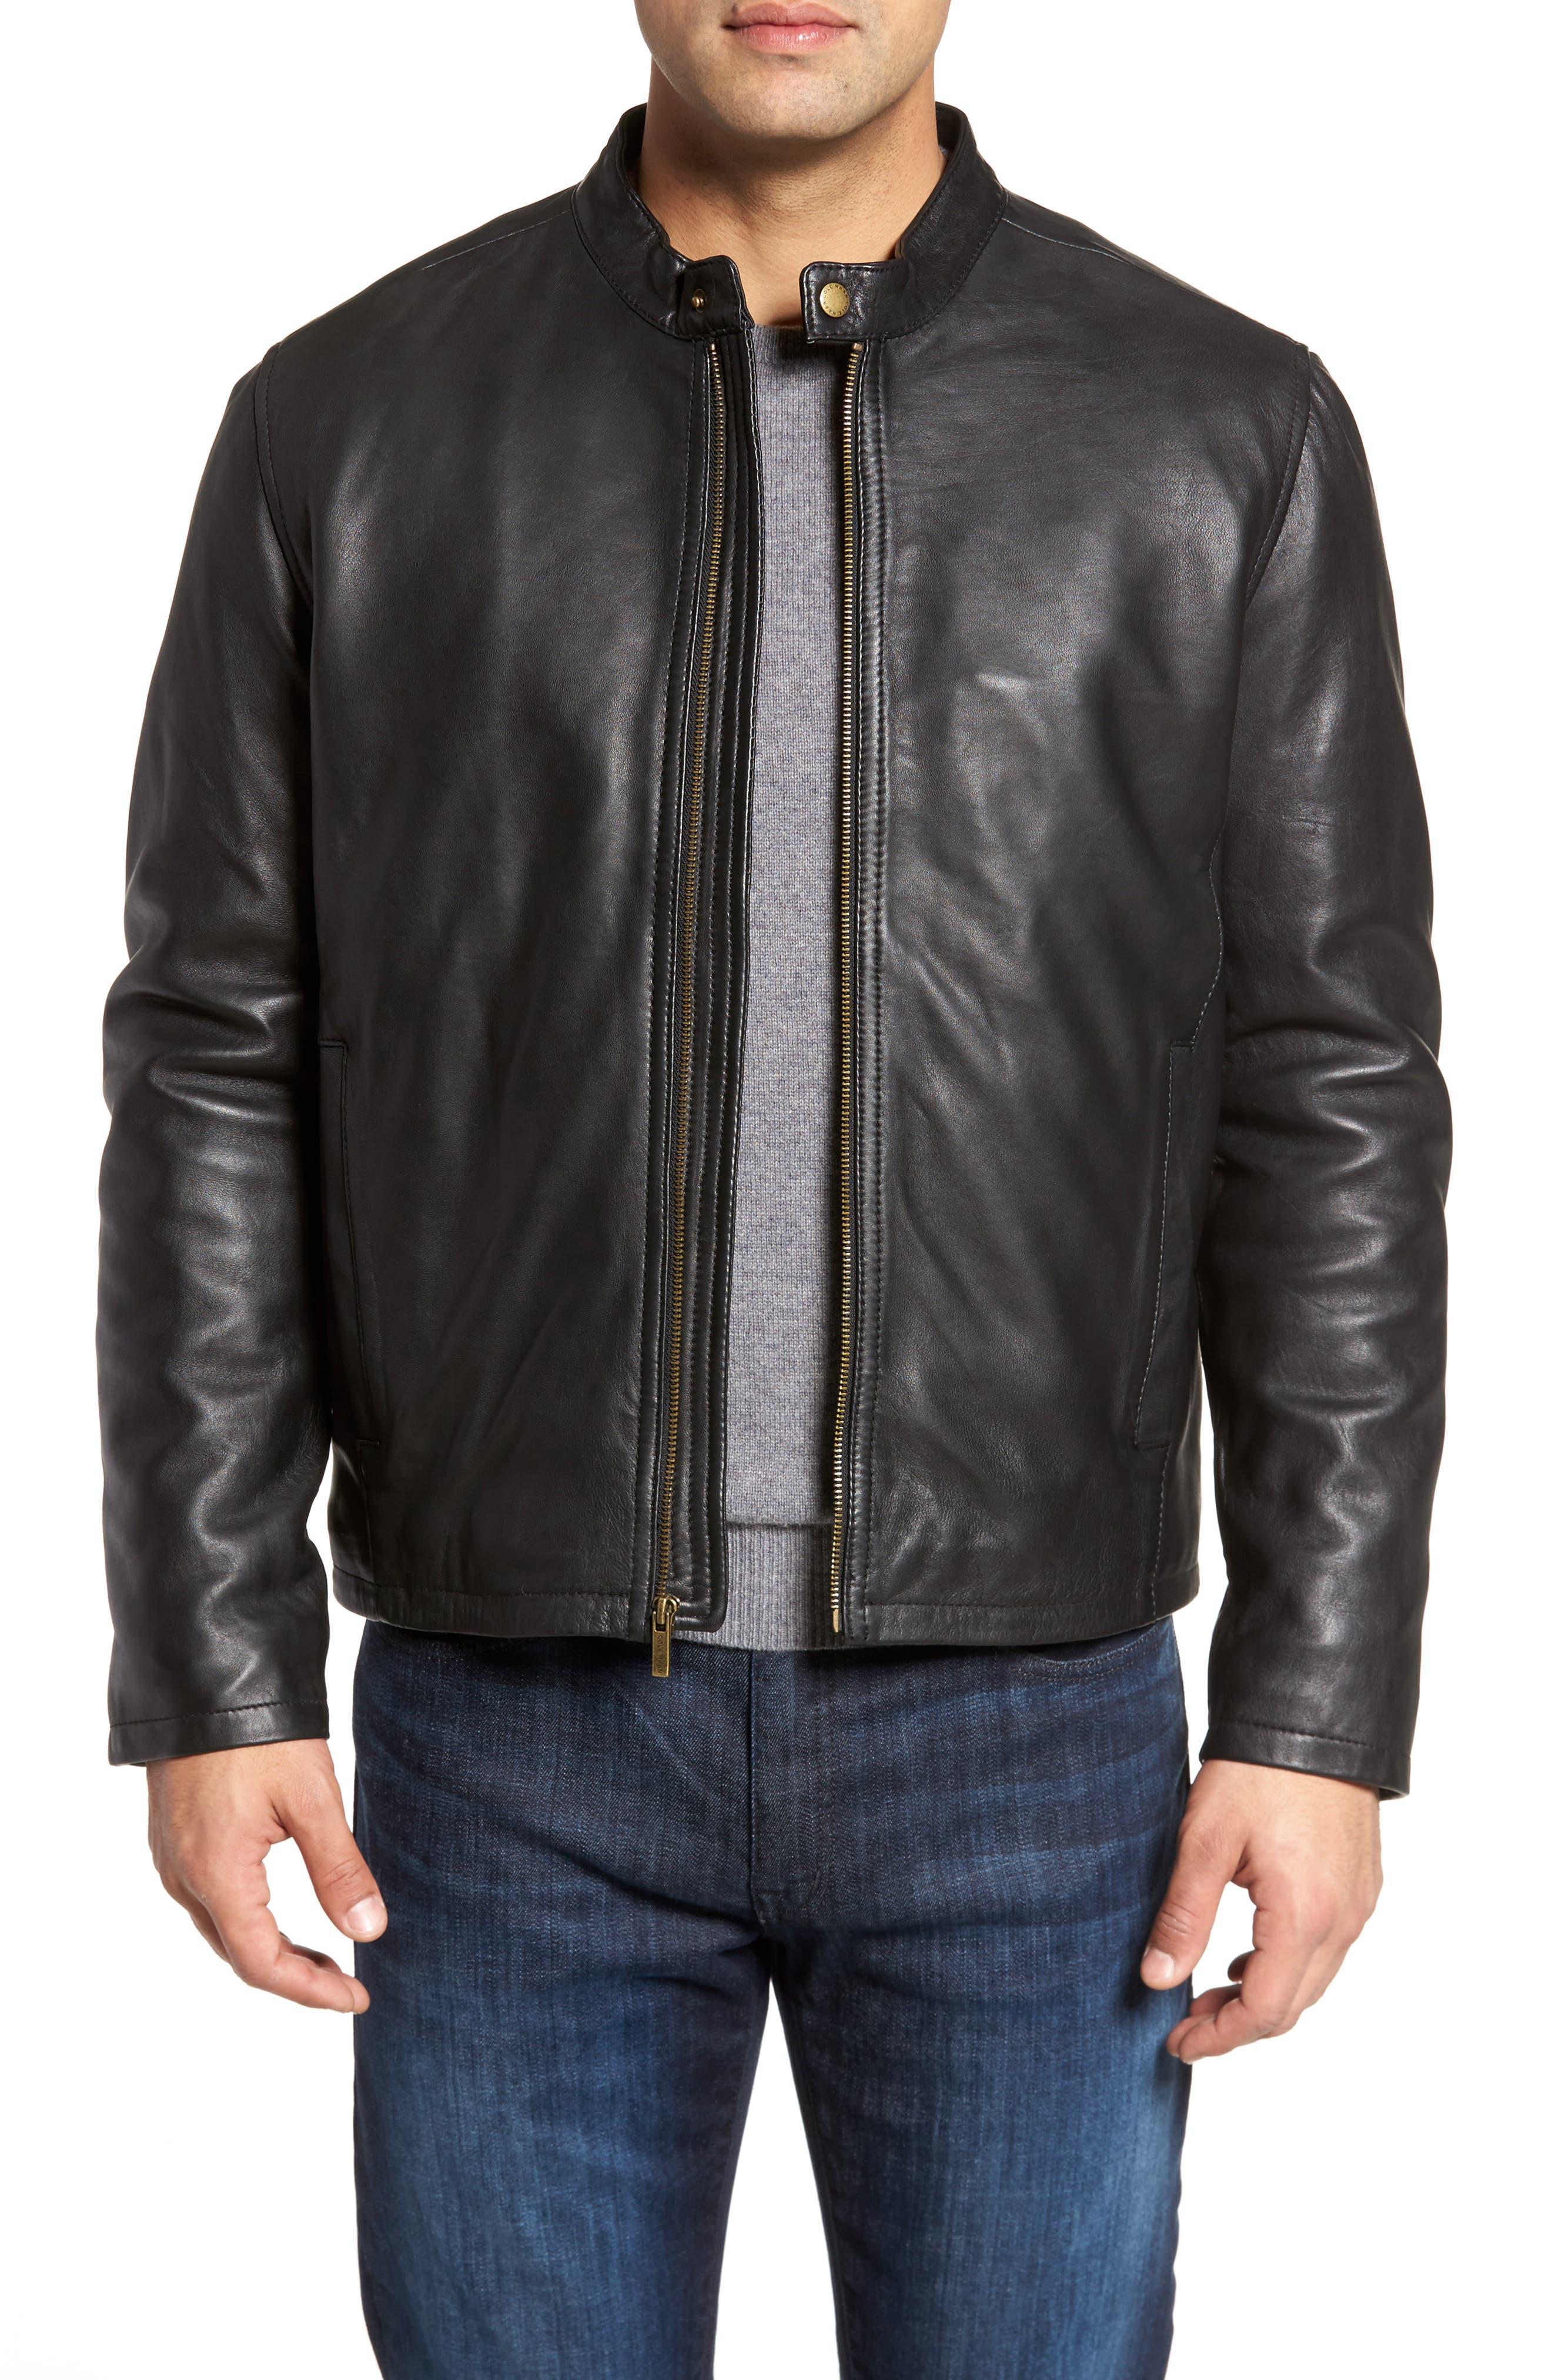 COLE HAAN Lambskin Leather Moto Jacket, Main, color, 001